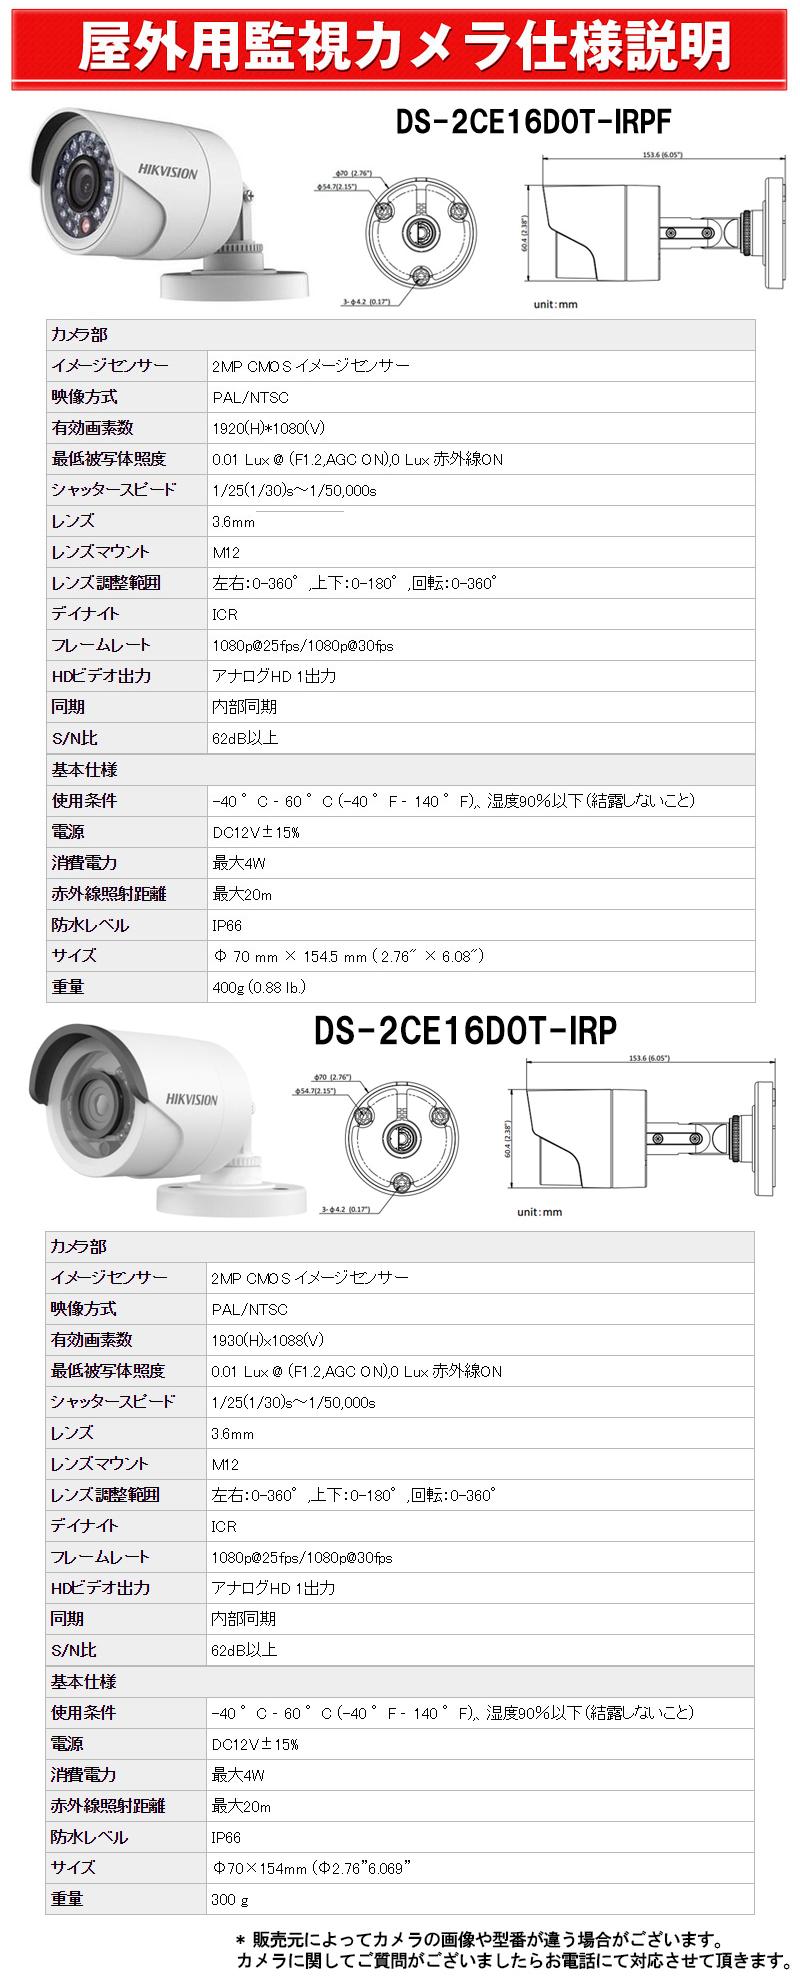 屋外用監視カメラ 仕様説明 DS-2CE16D0T-IRP